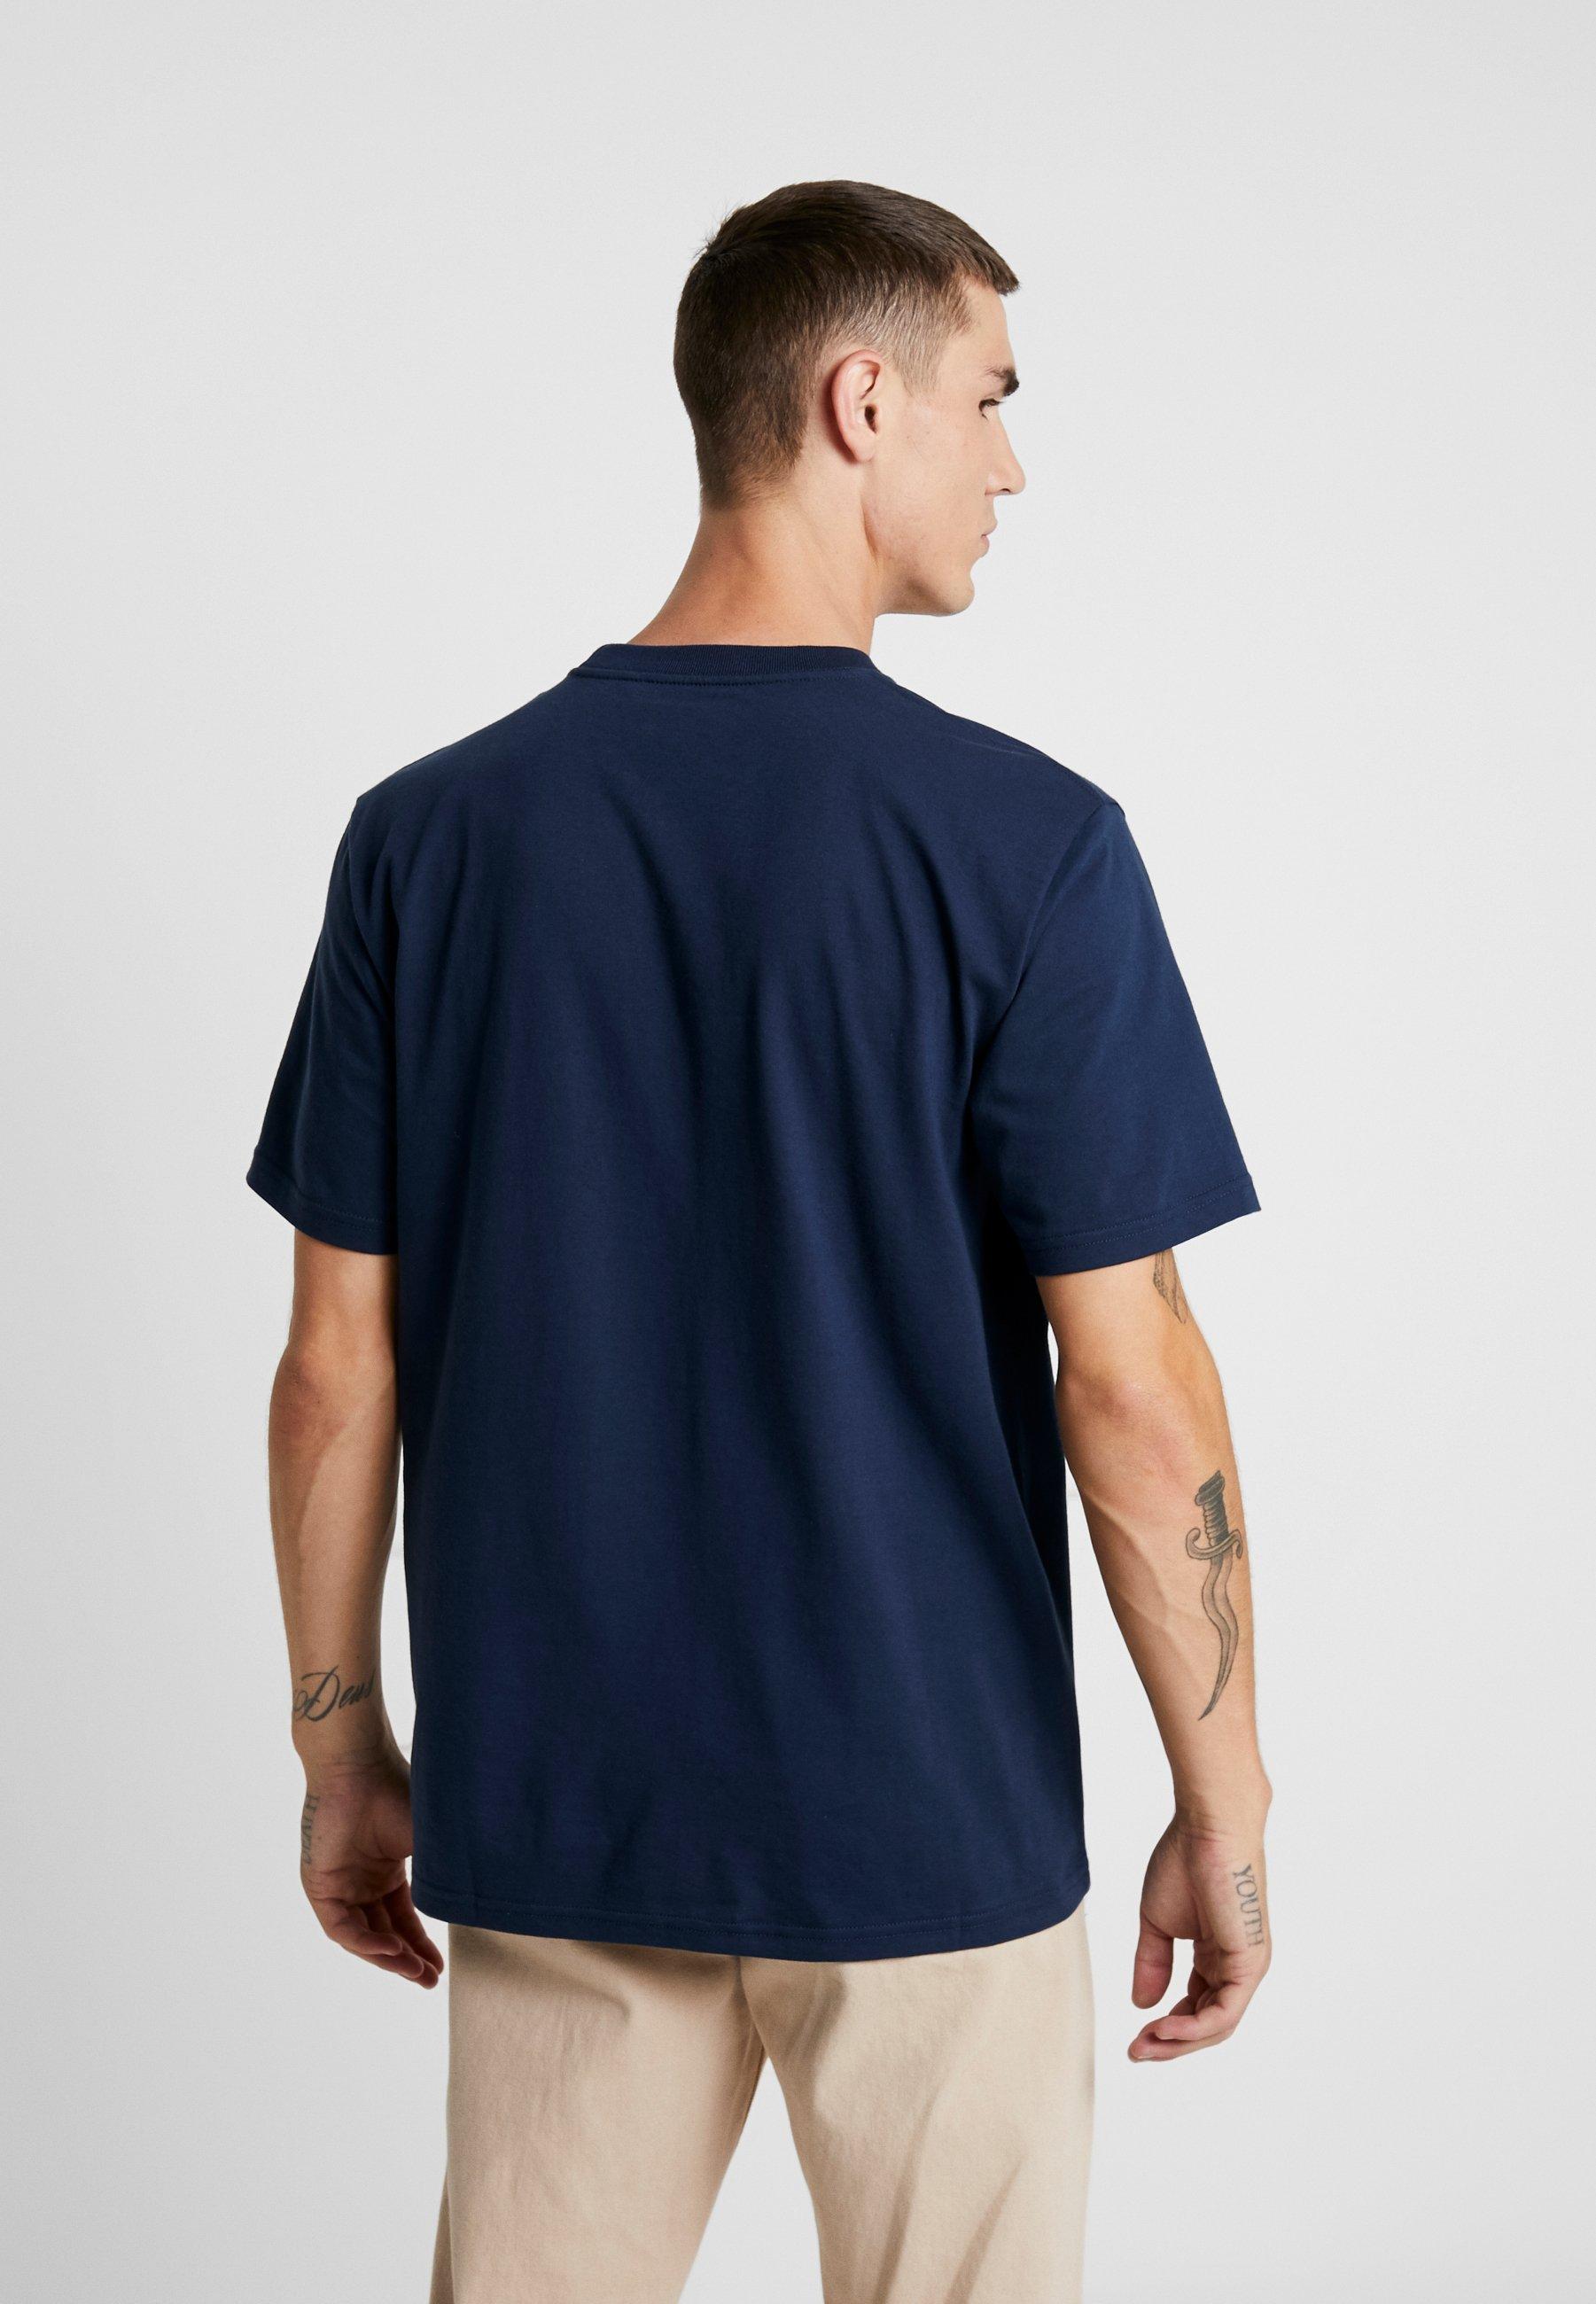 MonumentT Blue shirt Imprimé Wip Carhartt kuXOZPTi